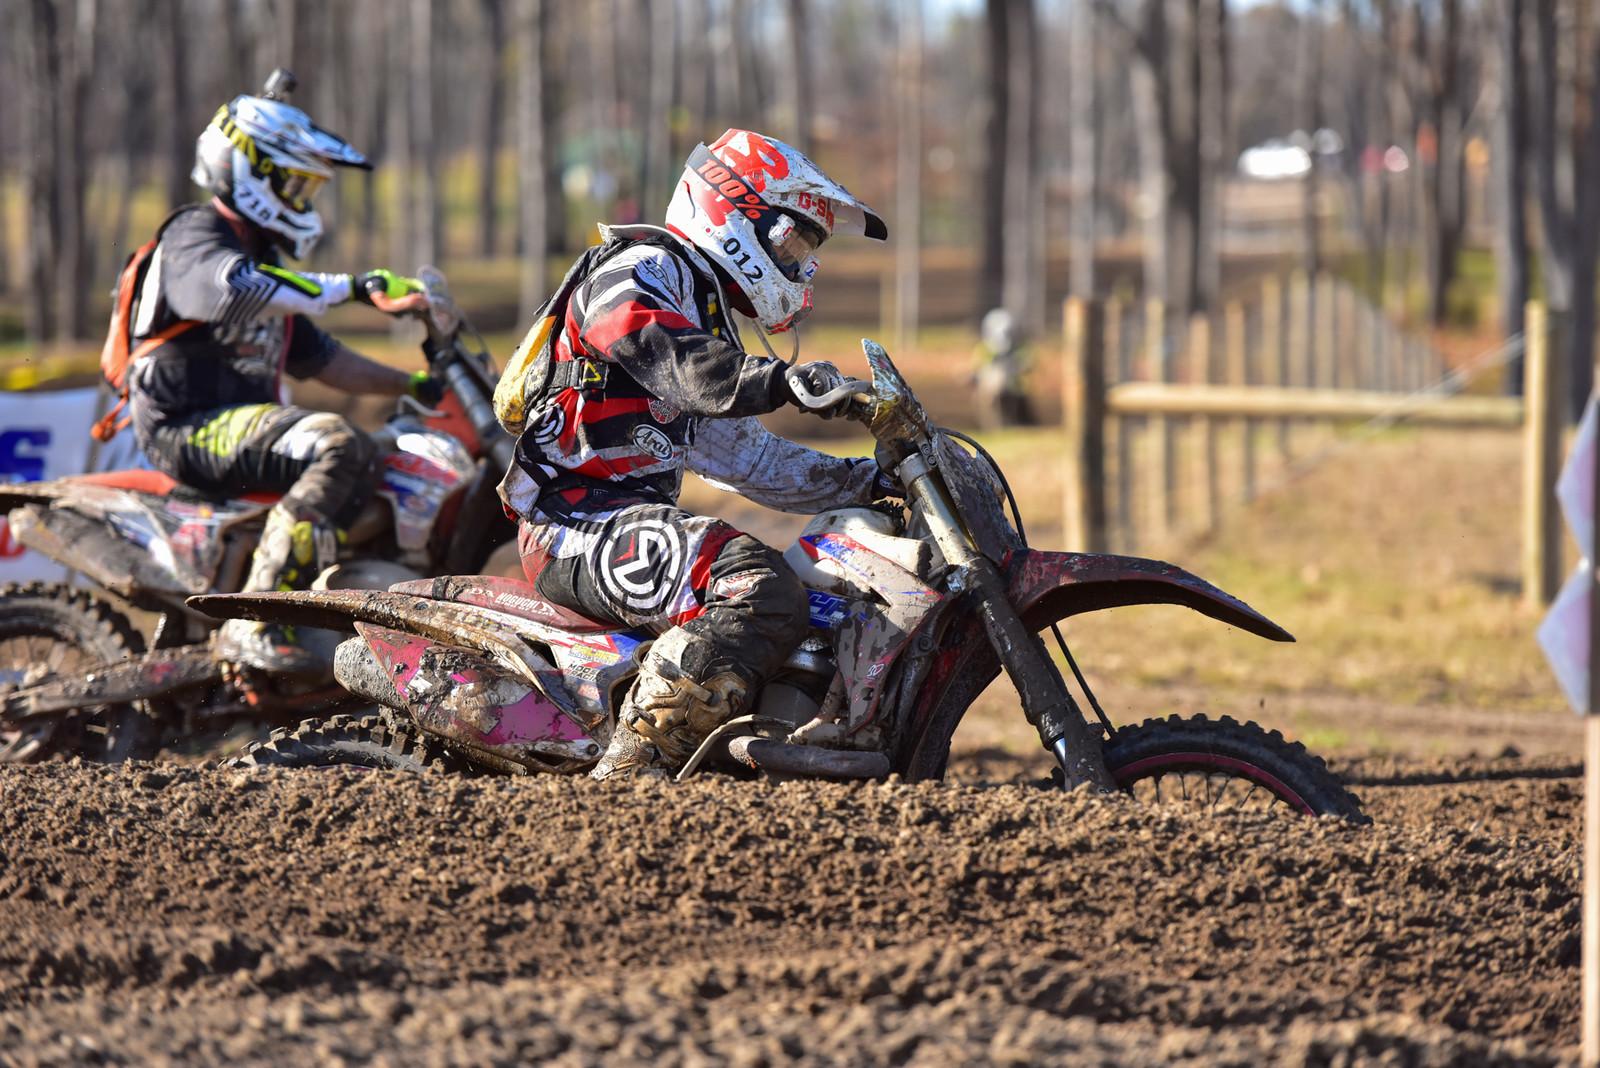 Takeshi Koikeda - Photo Blast: Ironman GNCC - Motocross Pictures - Vital MX